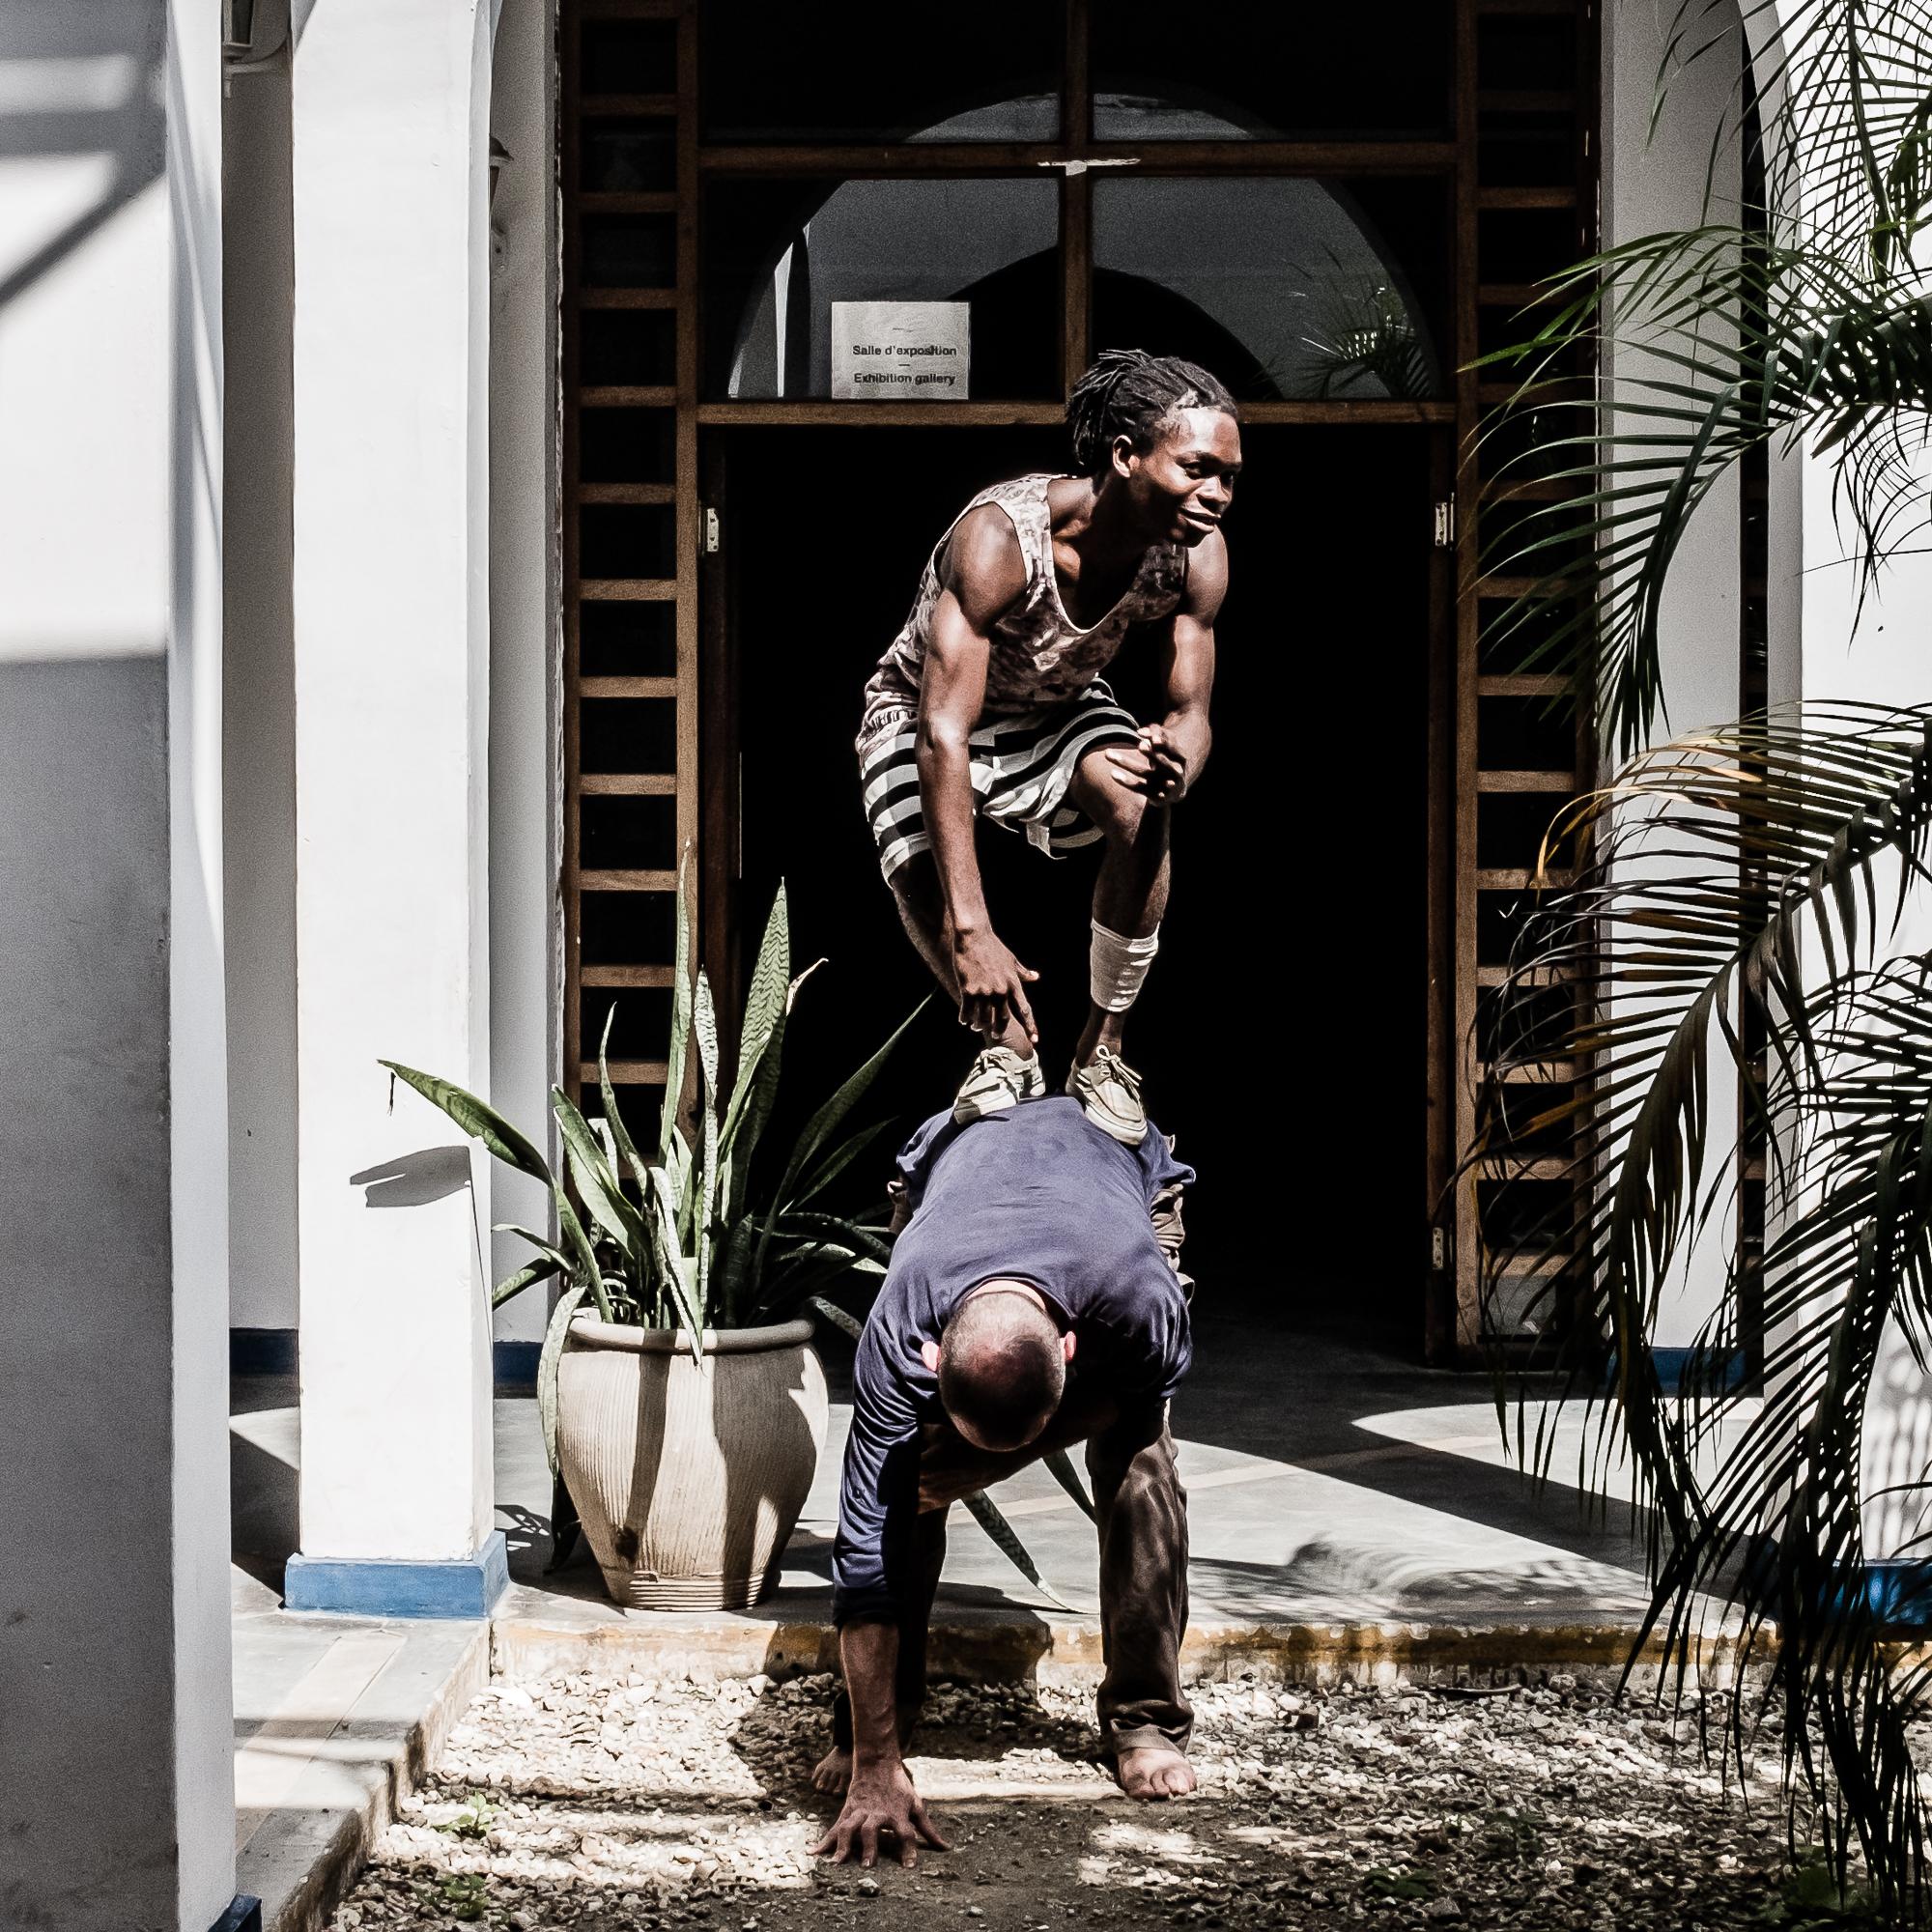 Dar Es Salaam - Kumi na tano